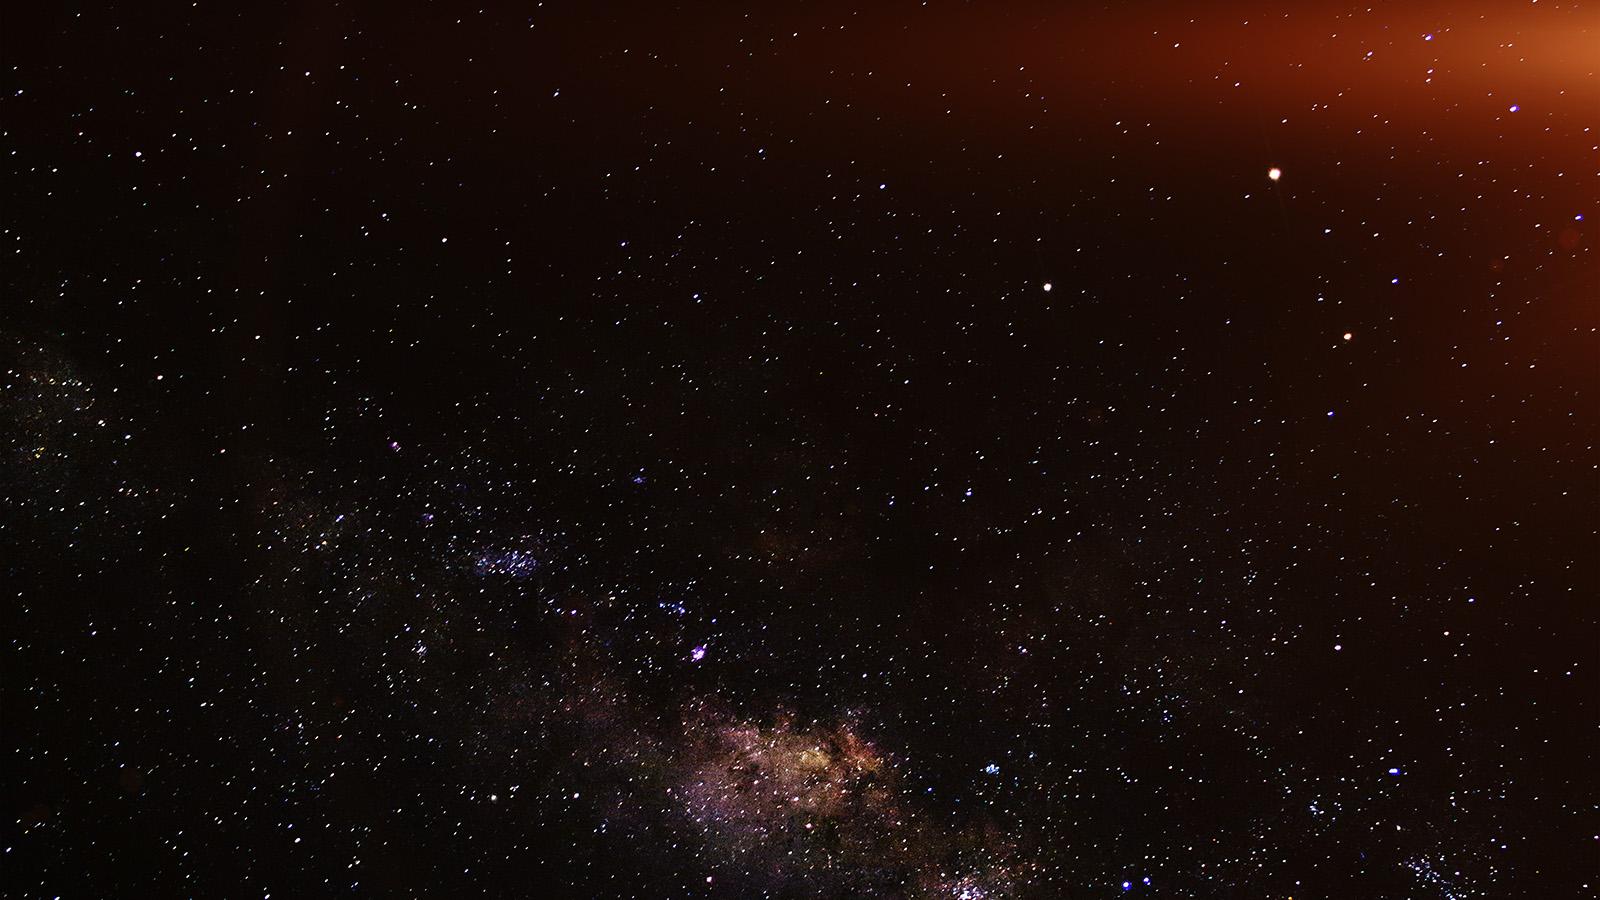 Fall Iphone 7 Plus Wallpaper Ni00 Space Flare Night Sky Star Dark Wallpaper